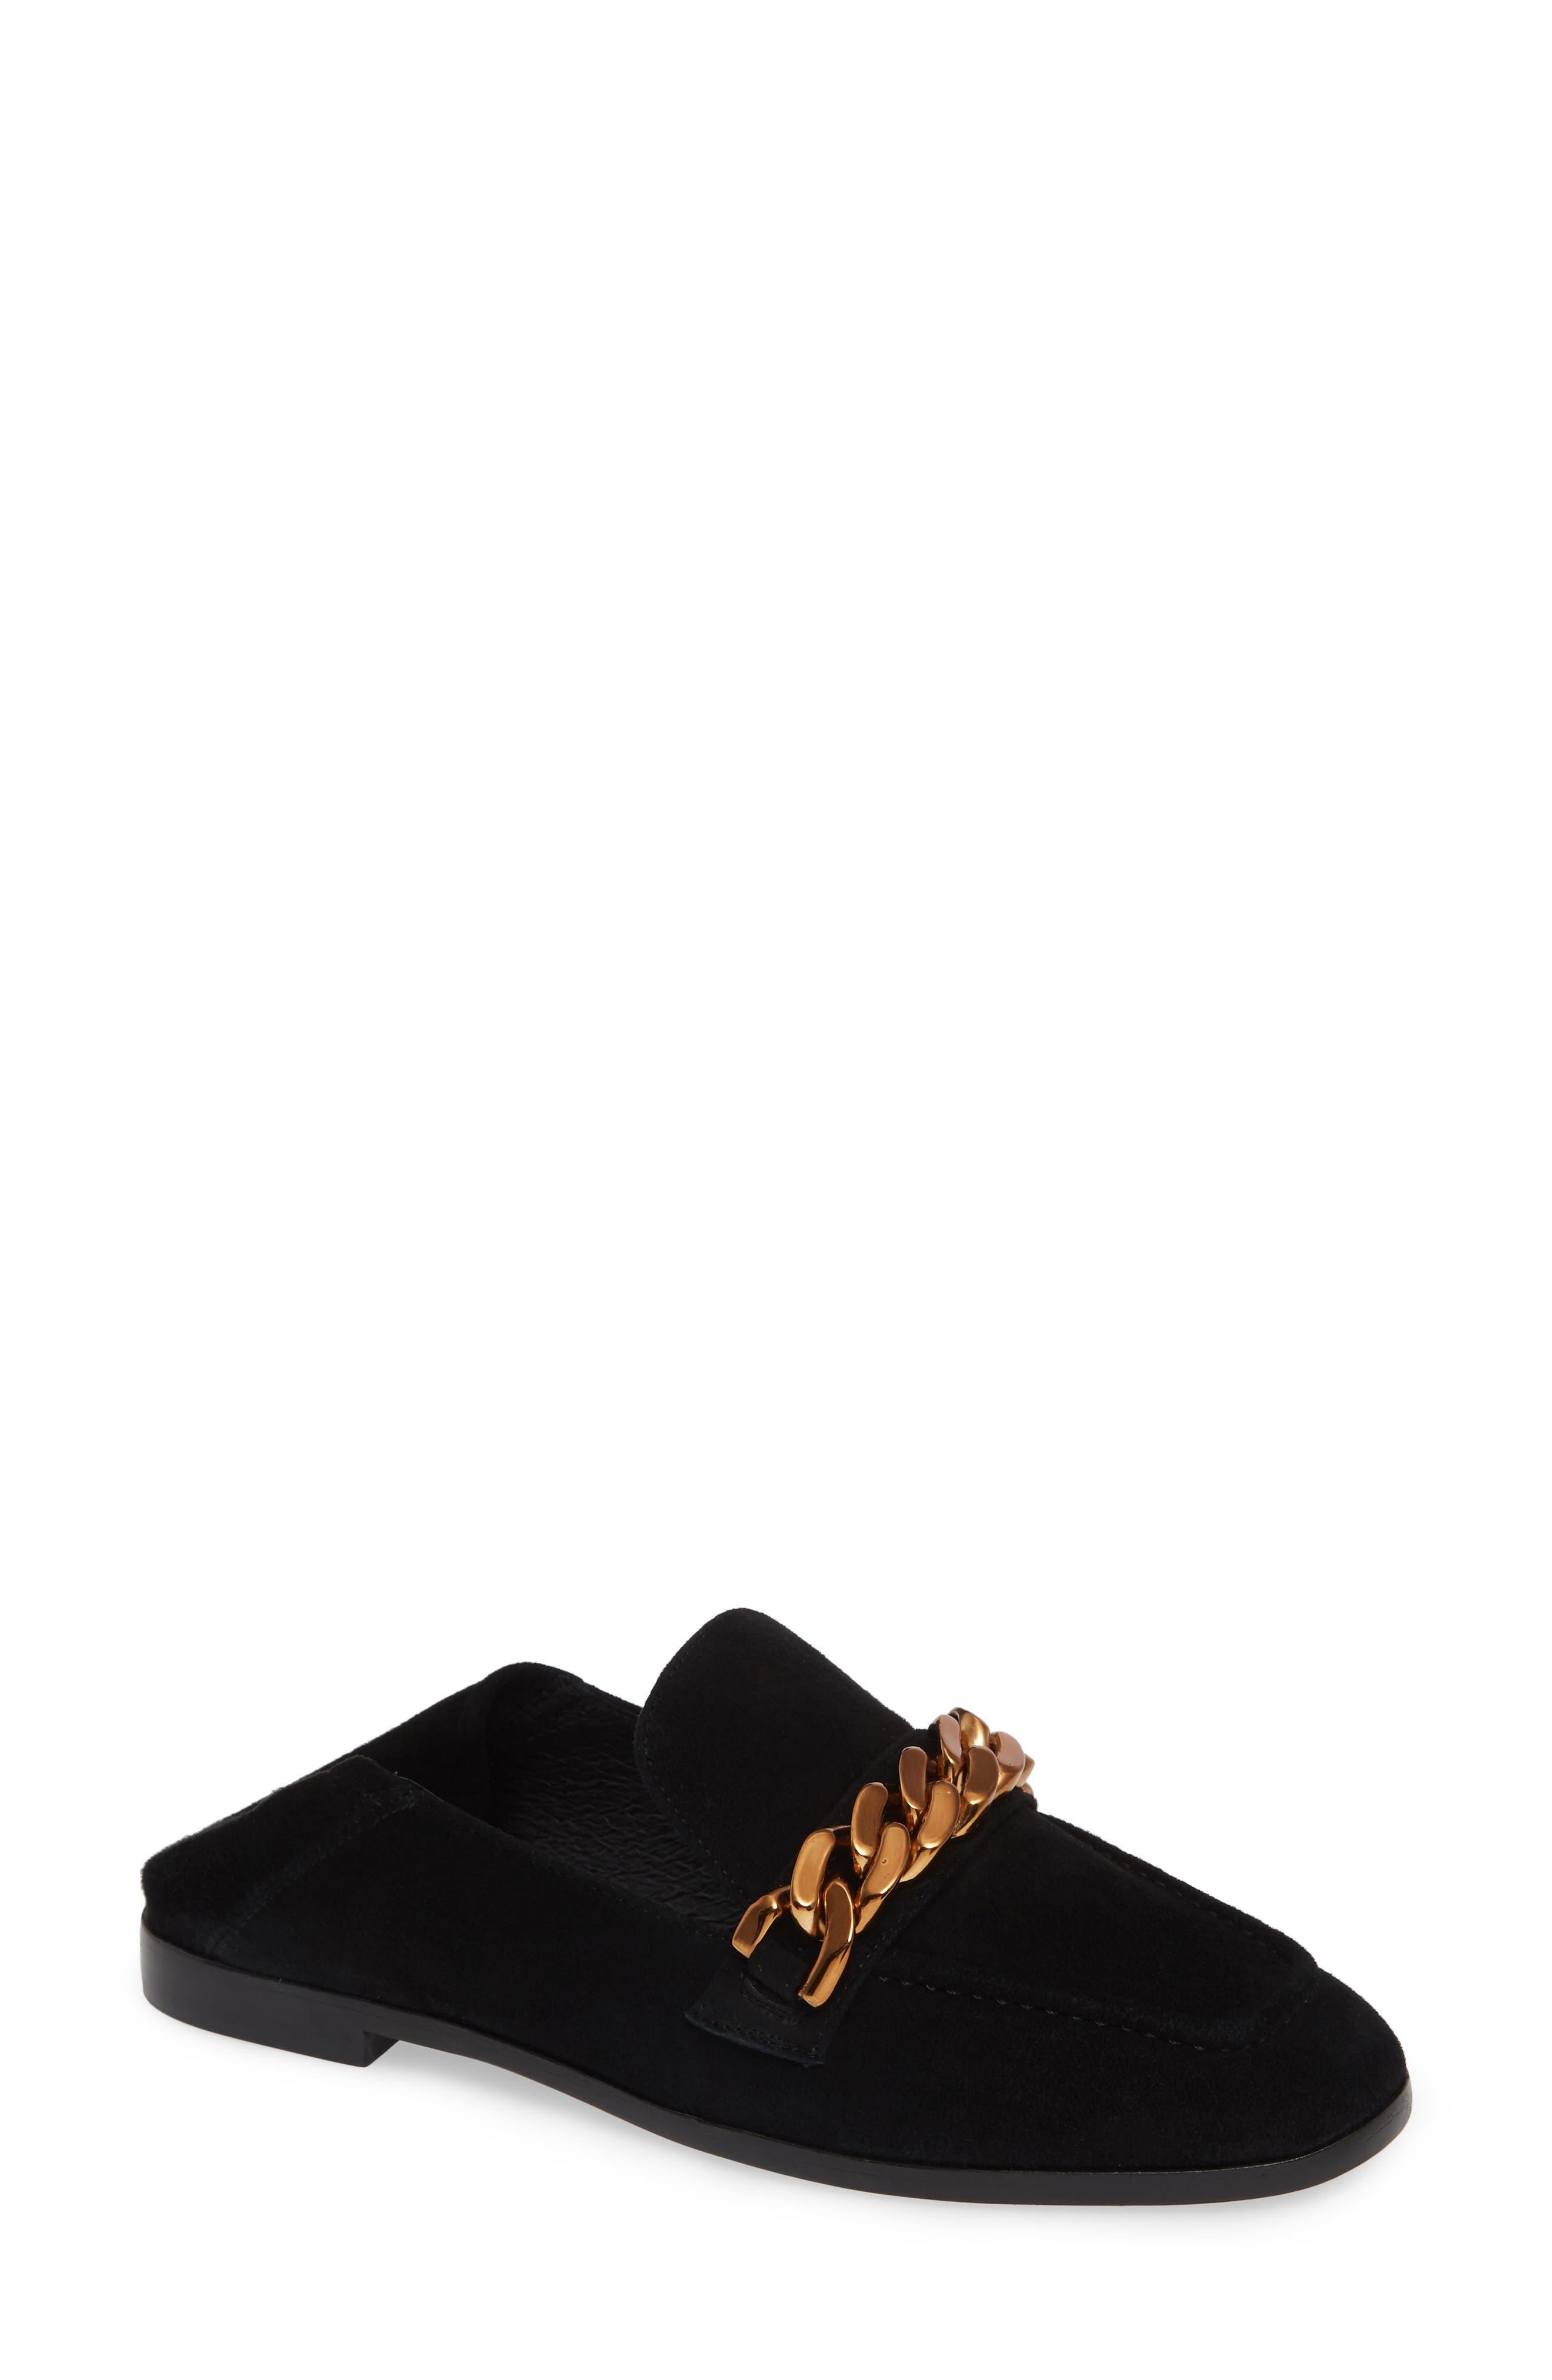 Jesse Convertible Heel Loafer,                         Main,                         color, BLACK SUEDE BRONZE